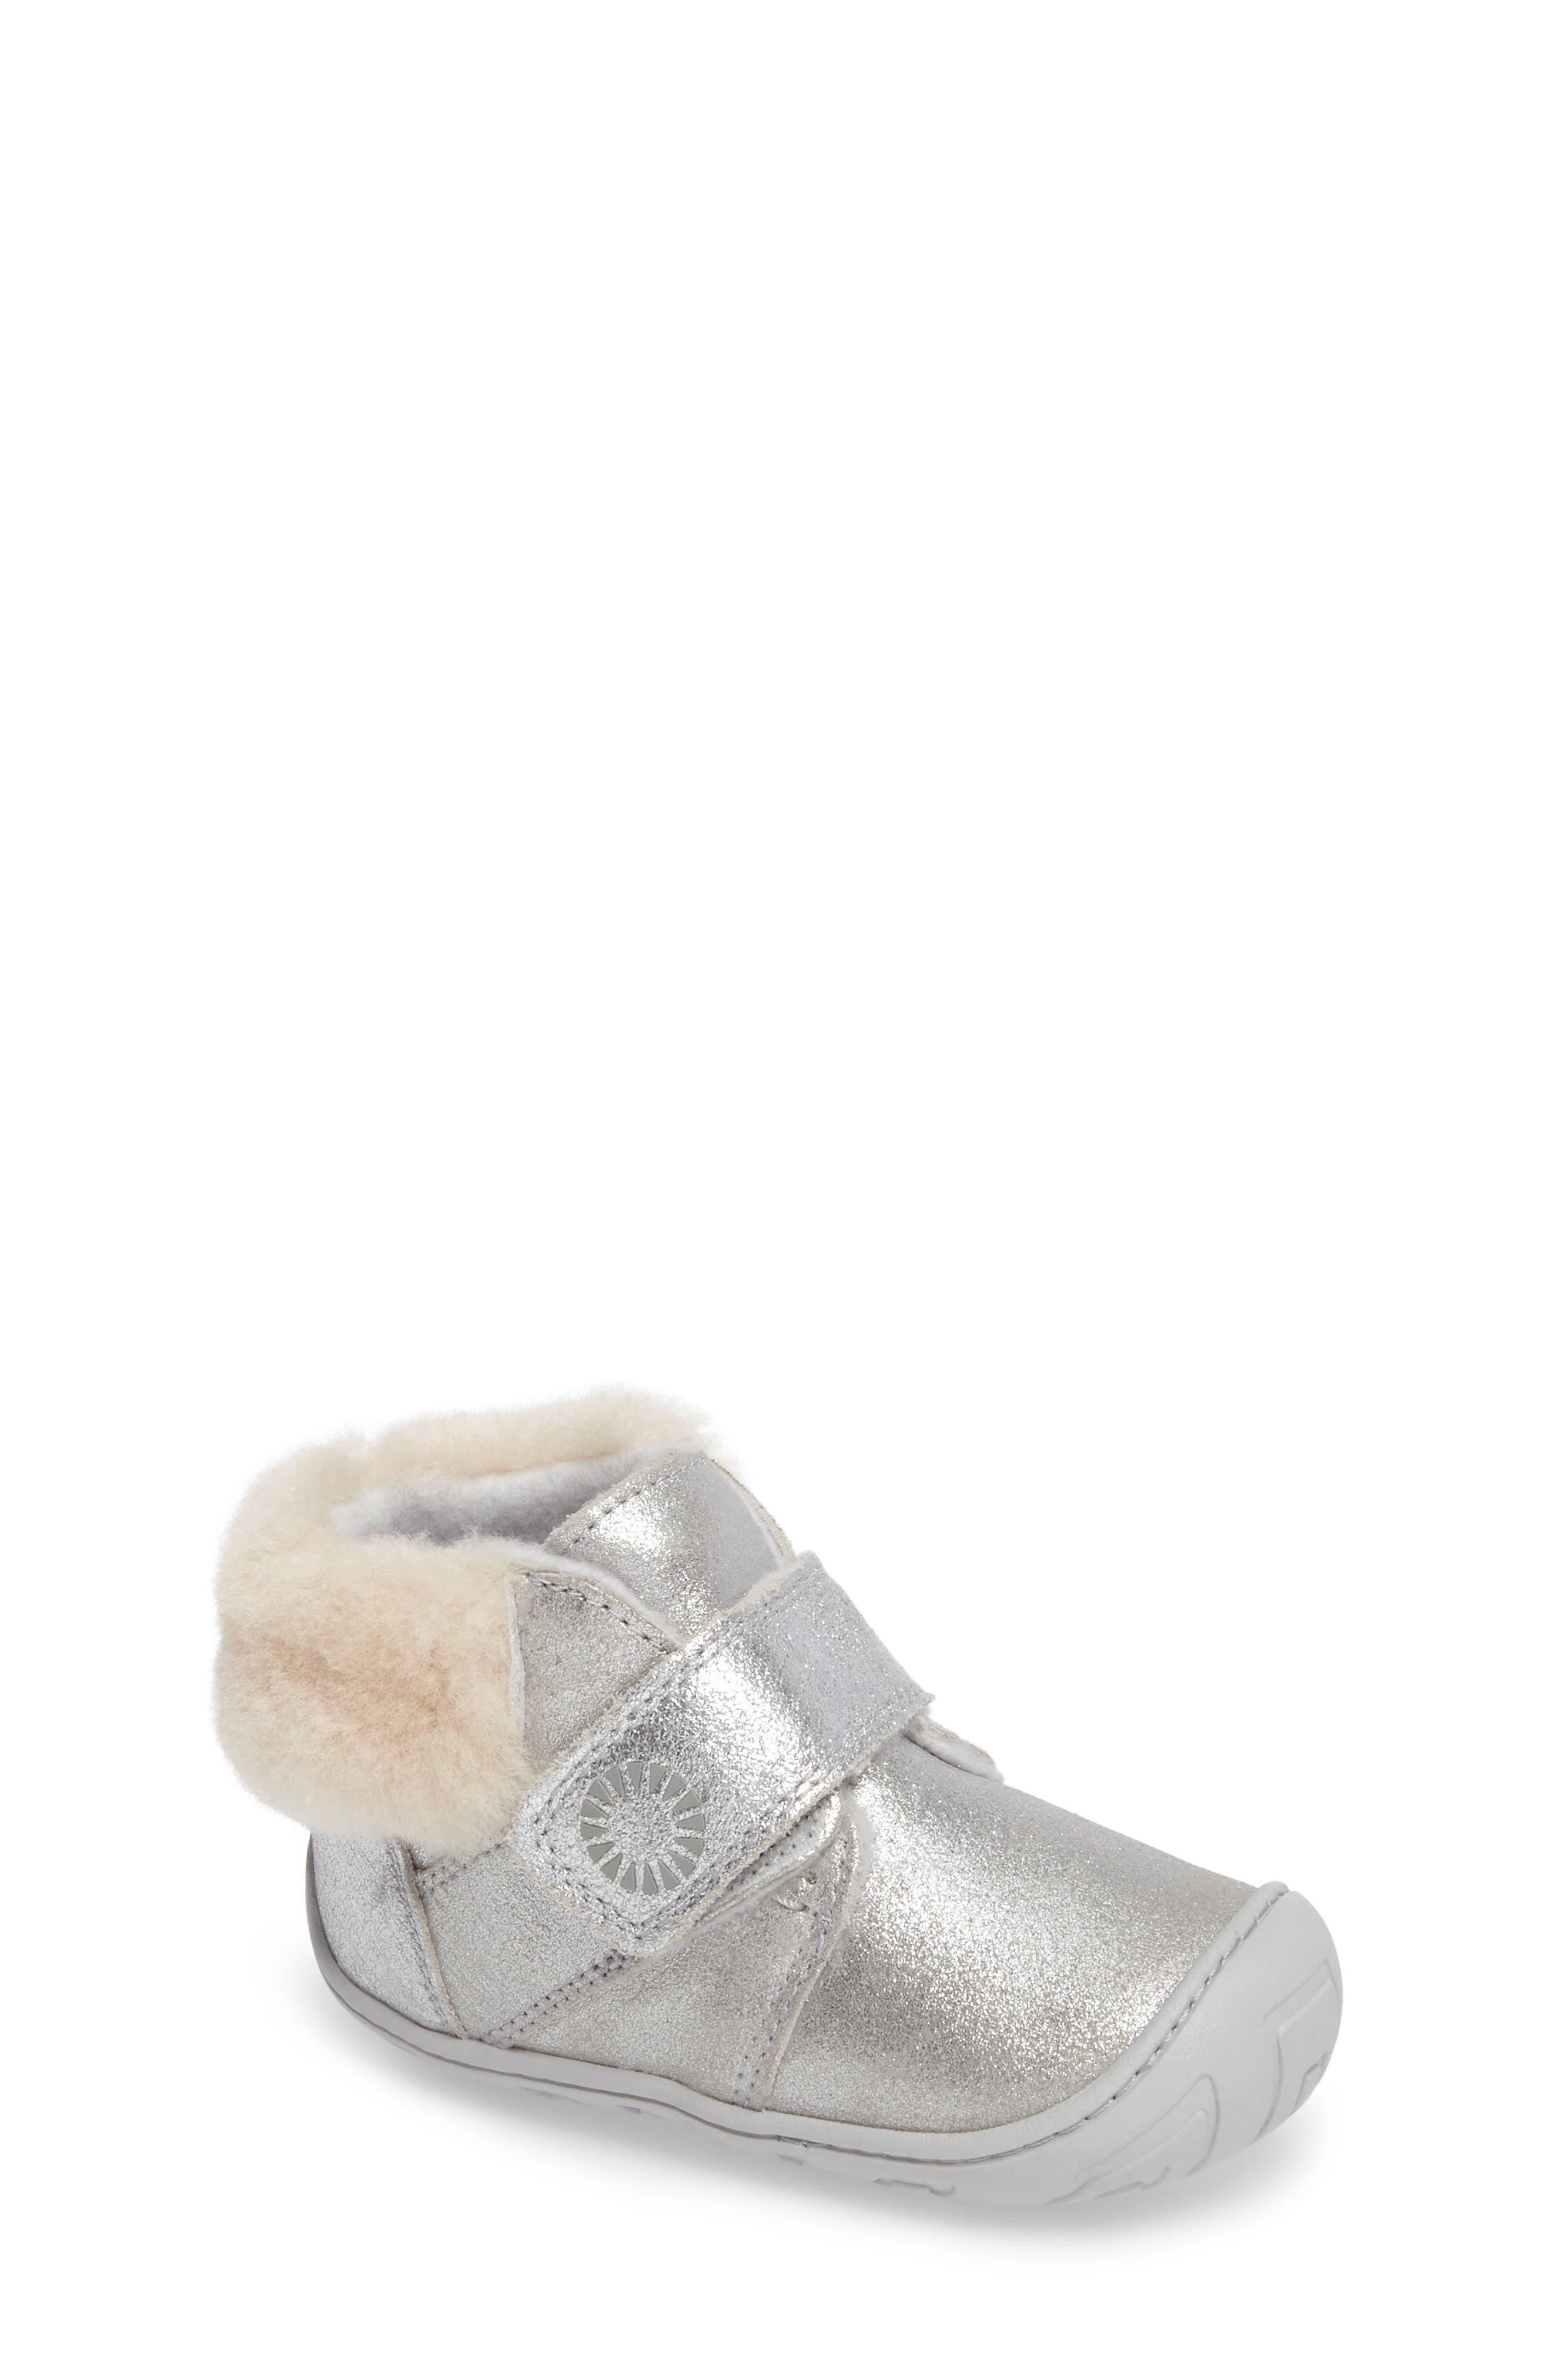 Main Image - UGG® Jorgen Metallic Genuine Shearling Bootie (Baby, Walker & Toddler)